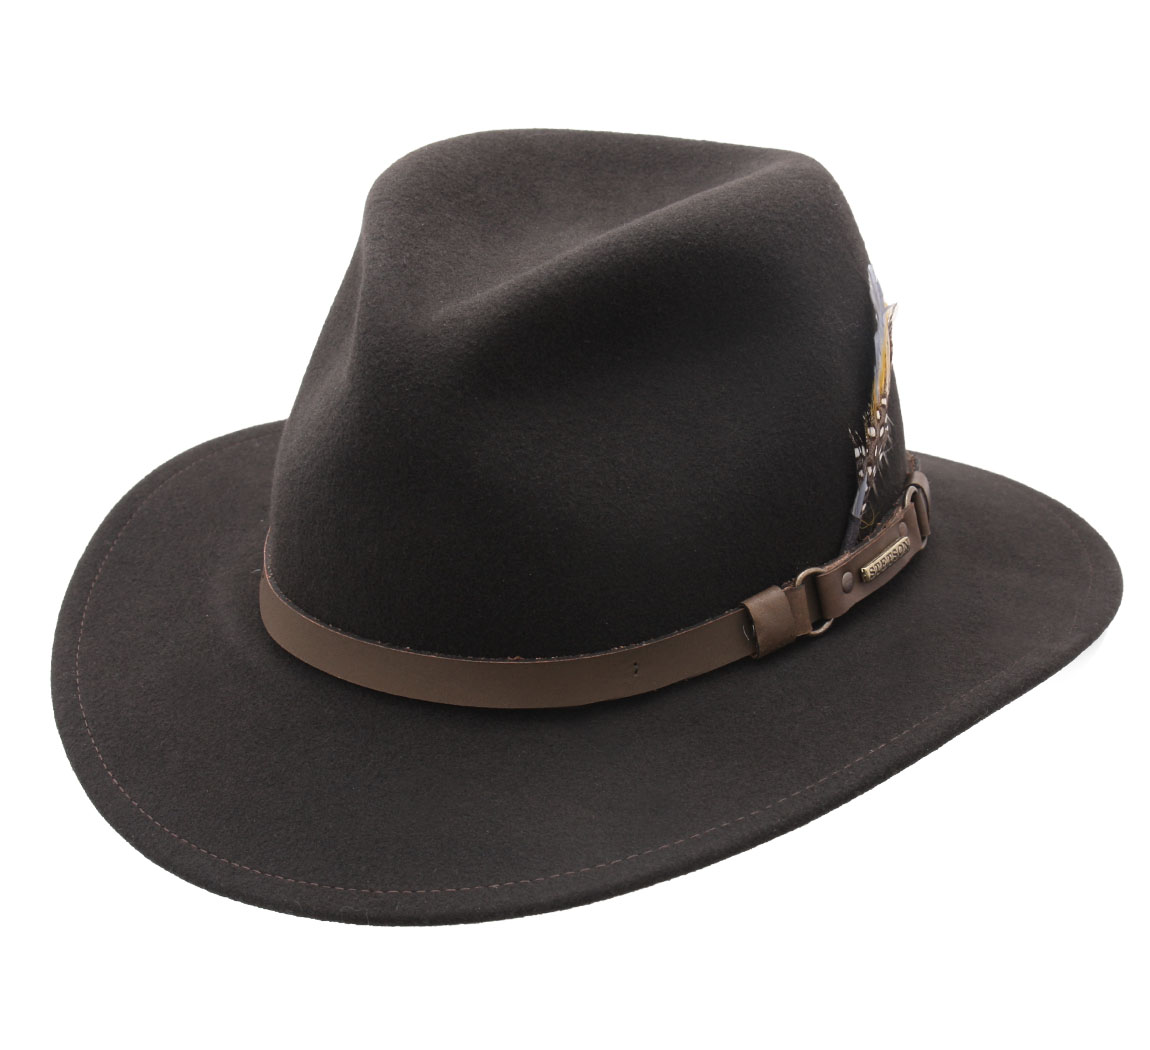 Hamlin - Hats Stetson c5c28a32a68e